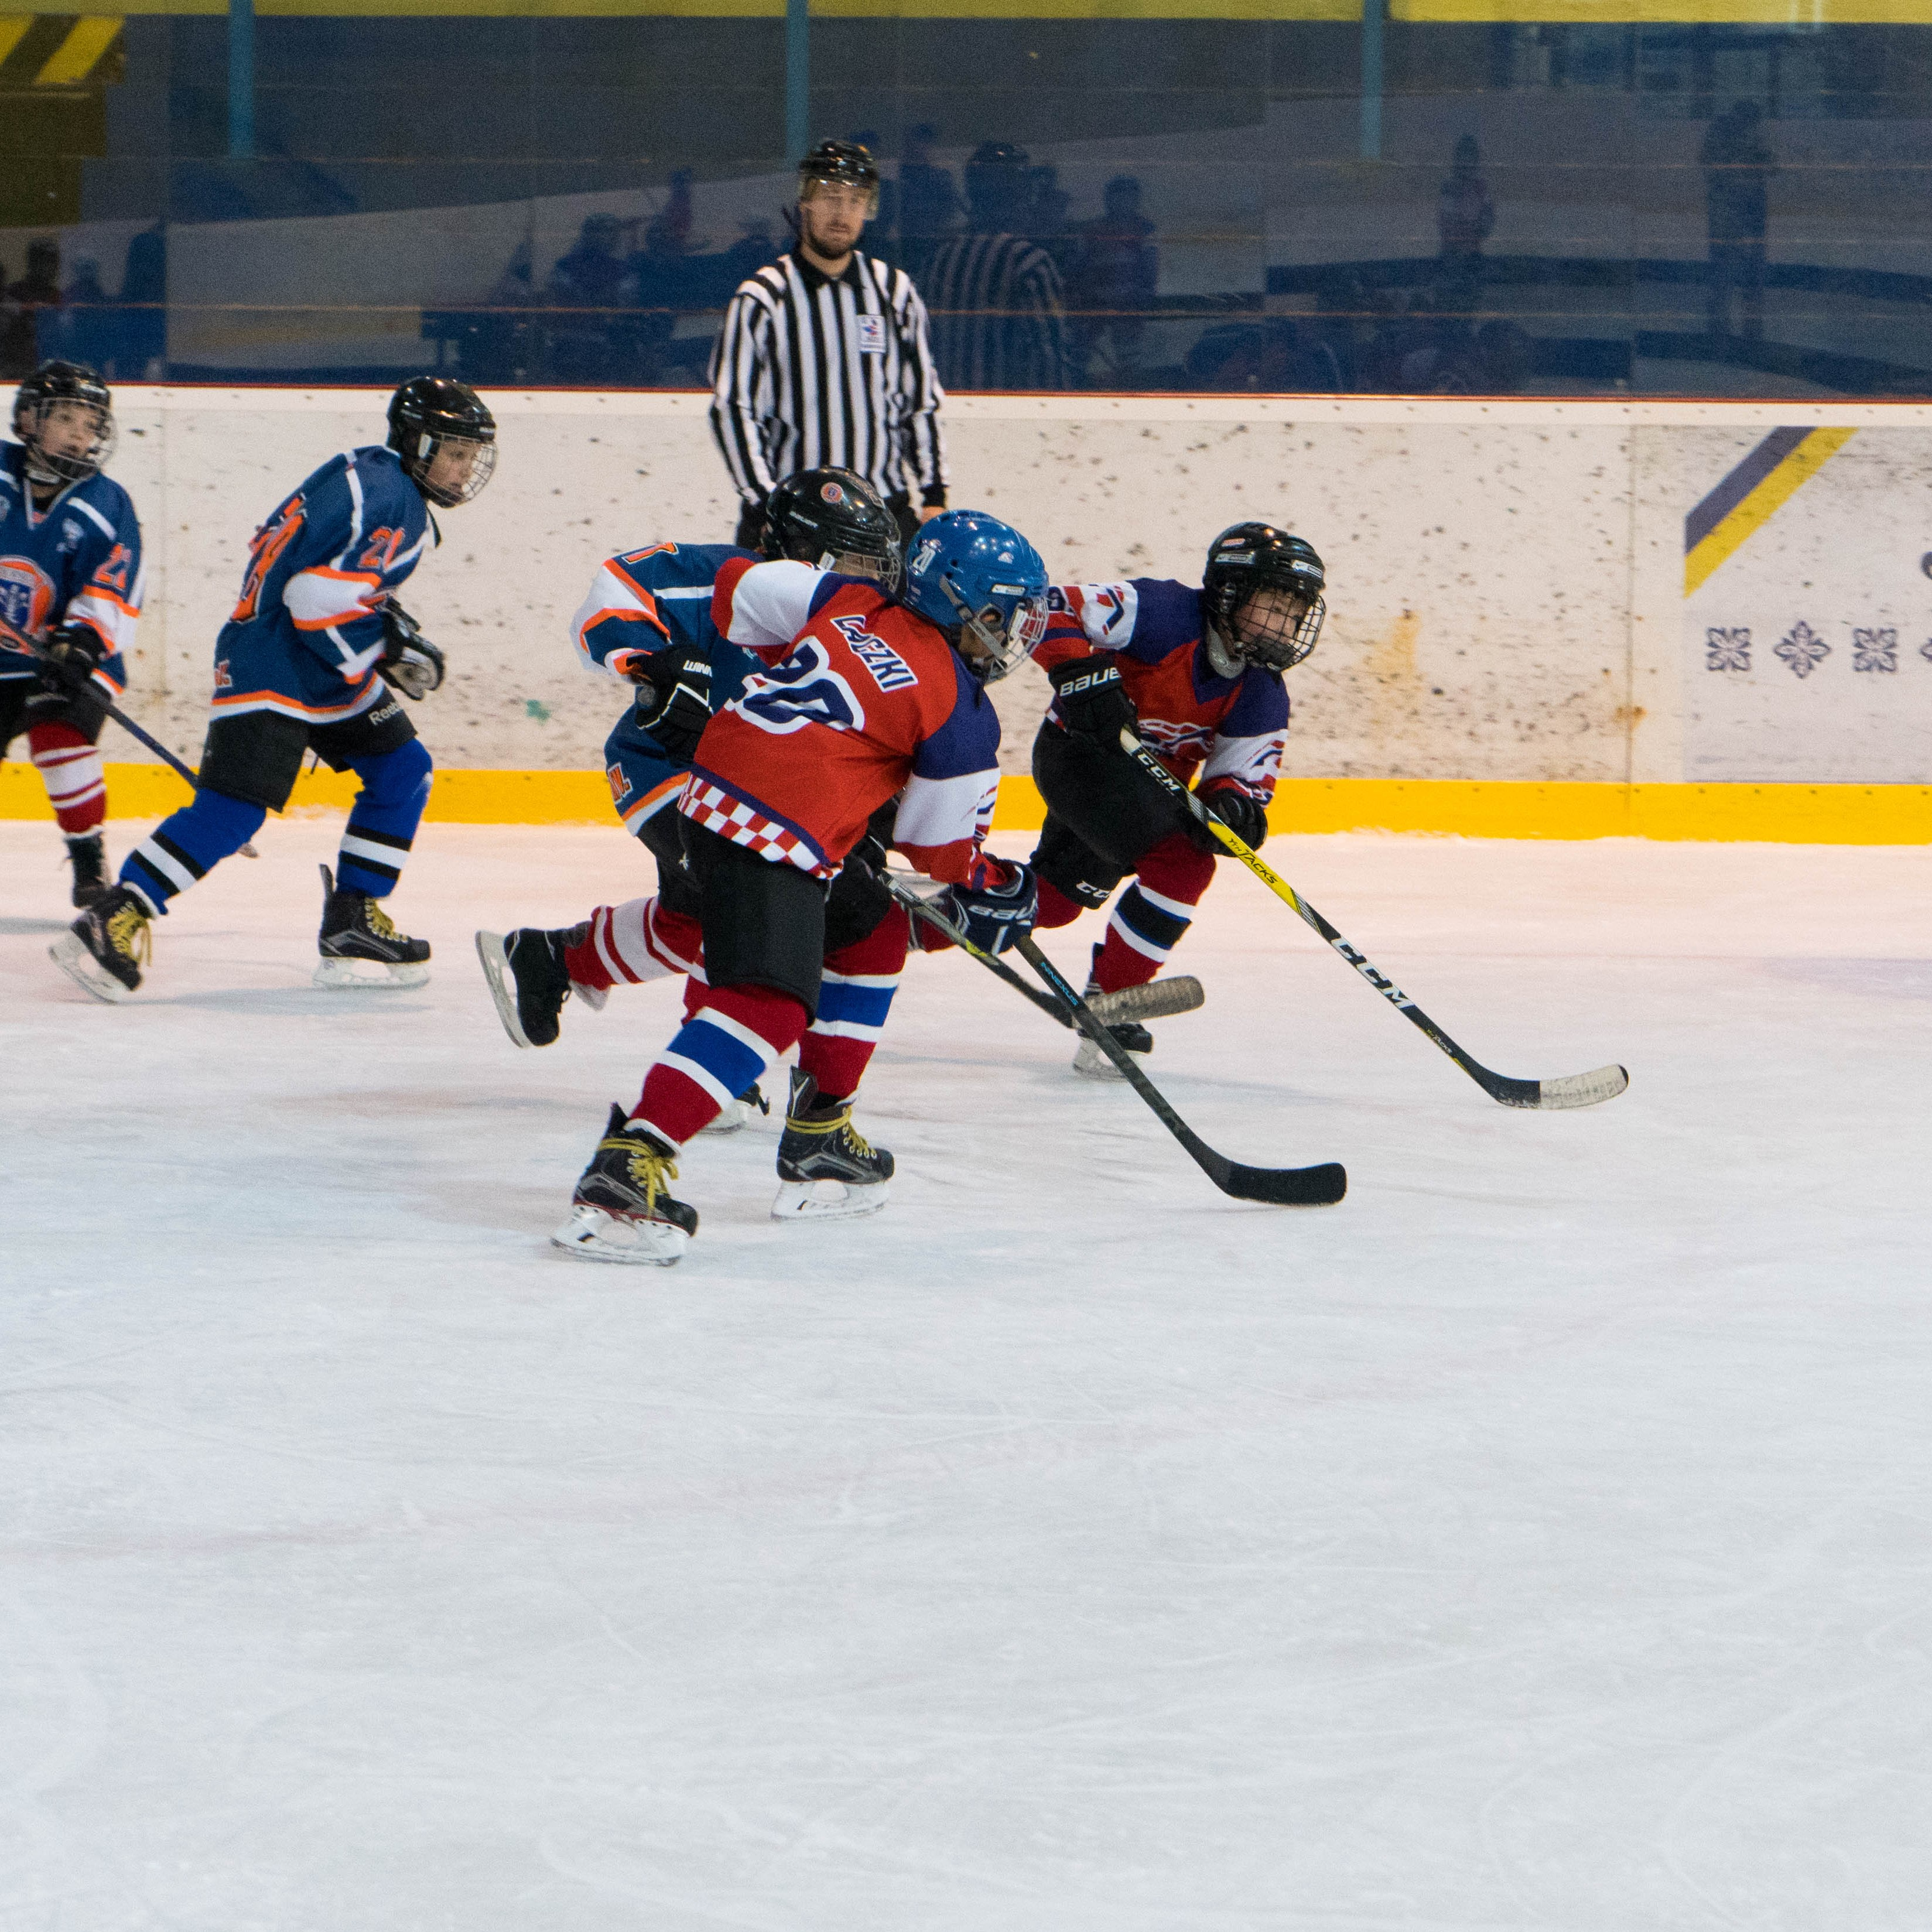 hokejovy turnaj Puchov 2.miesto speeders bratislava 4